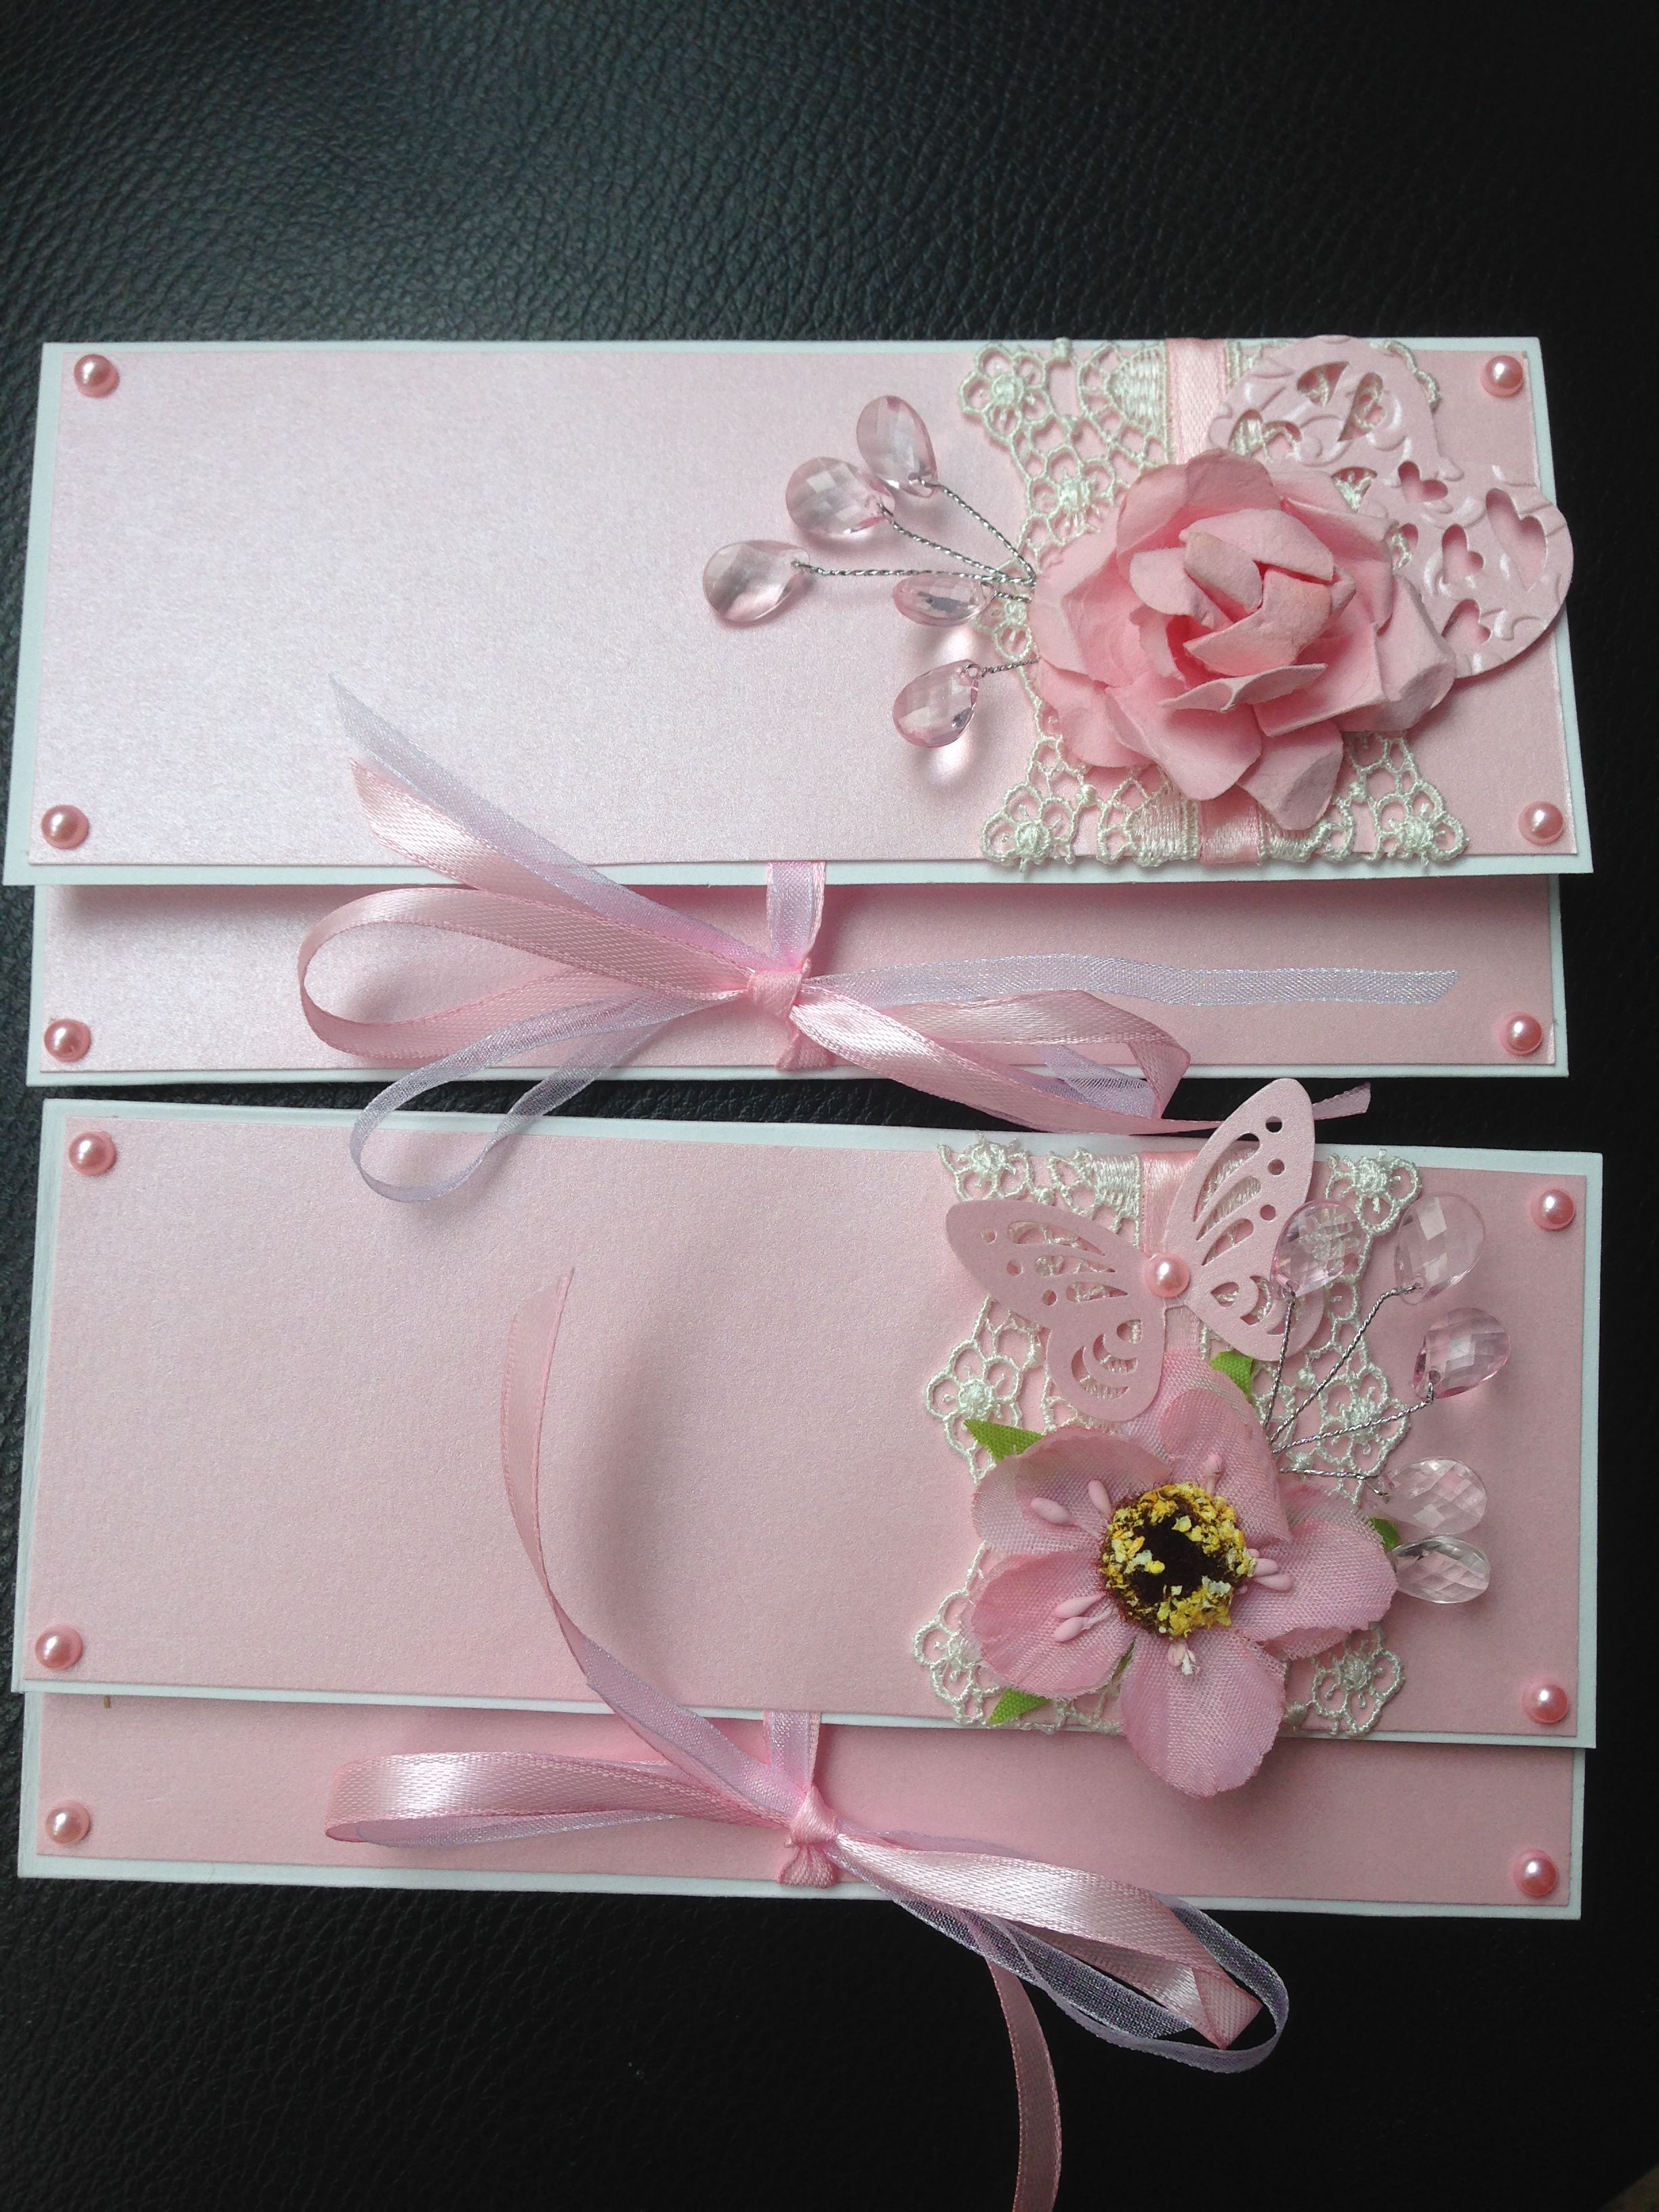 pinjayne gaudion on card ideas  cards handmade gift